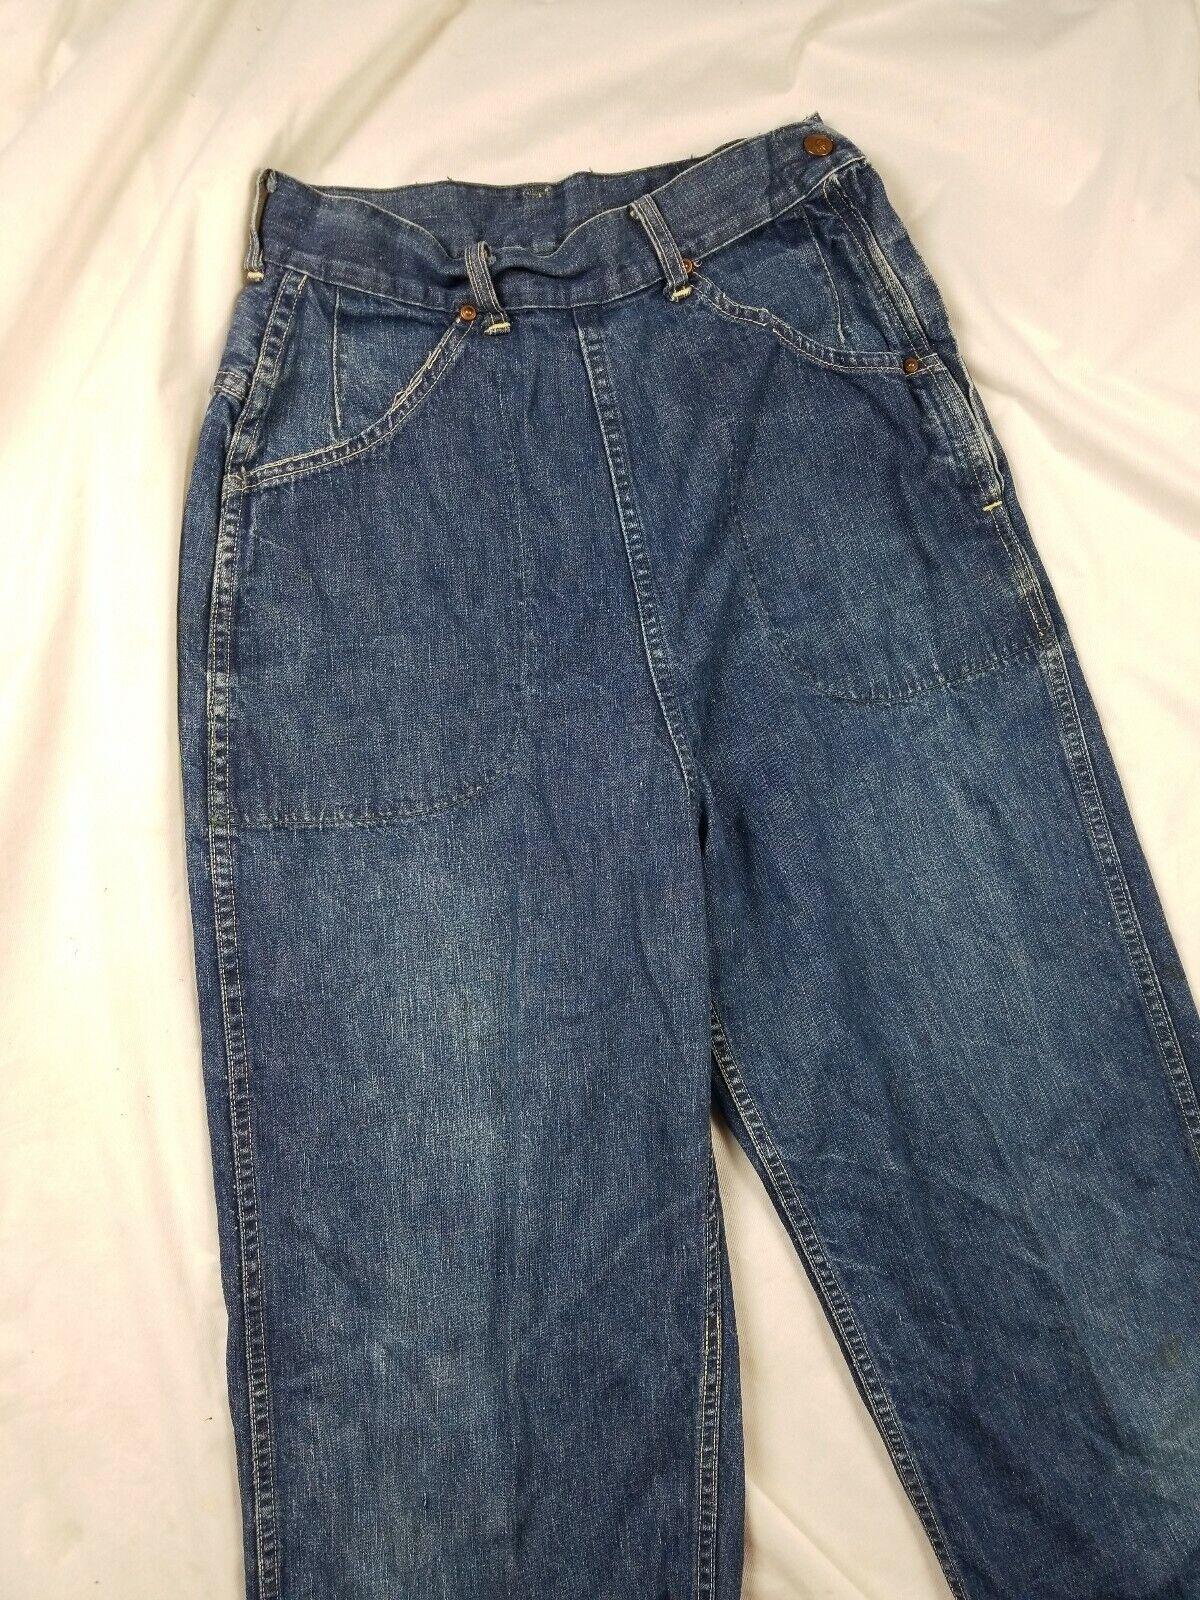 Vintage 1940s Lee High Waisted Side Zip Jeans Usa… - image 2